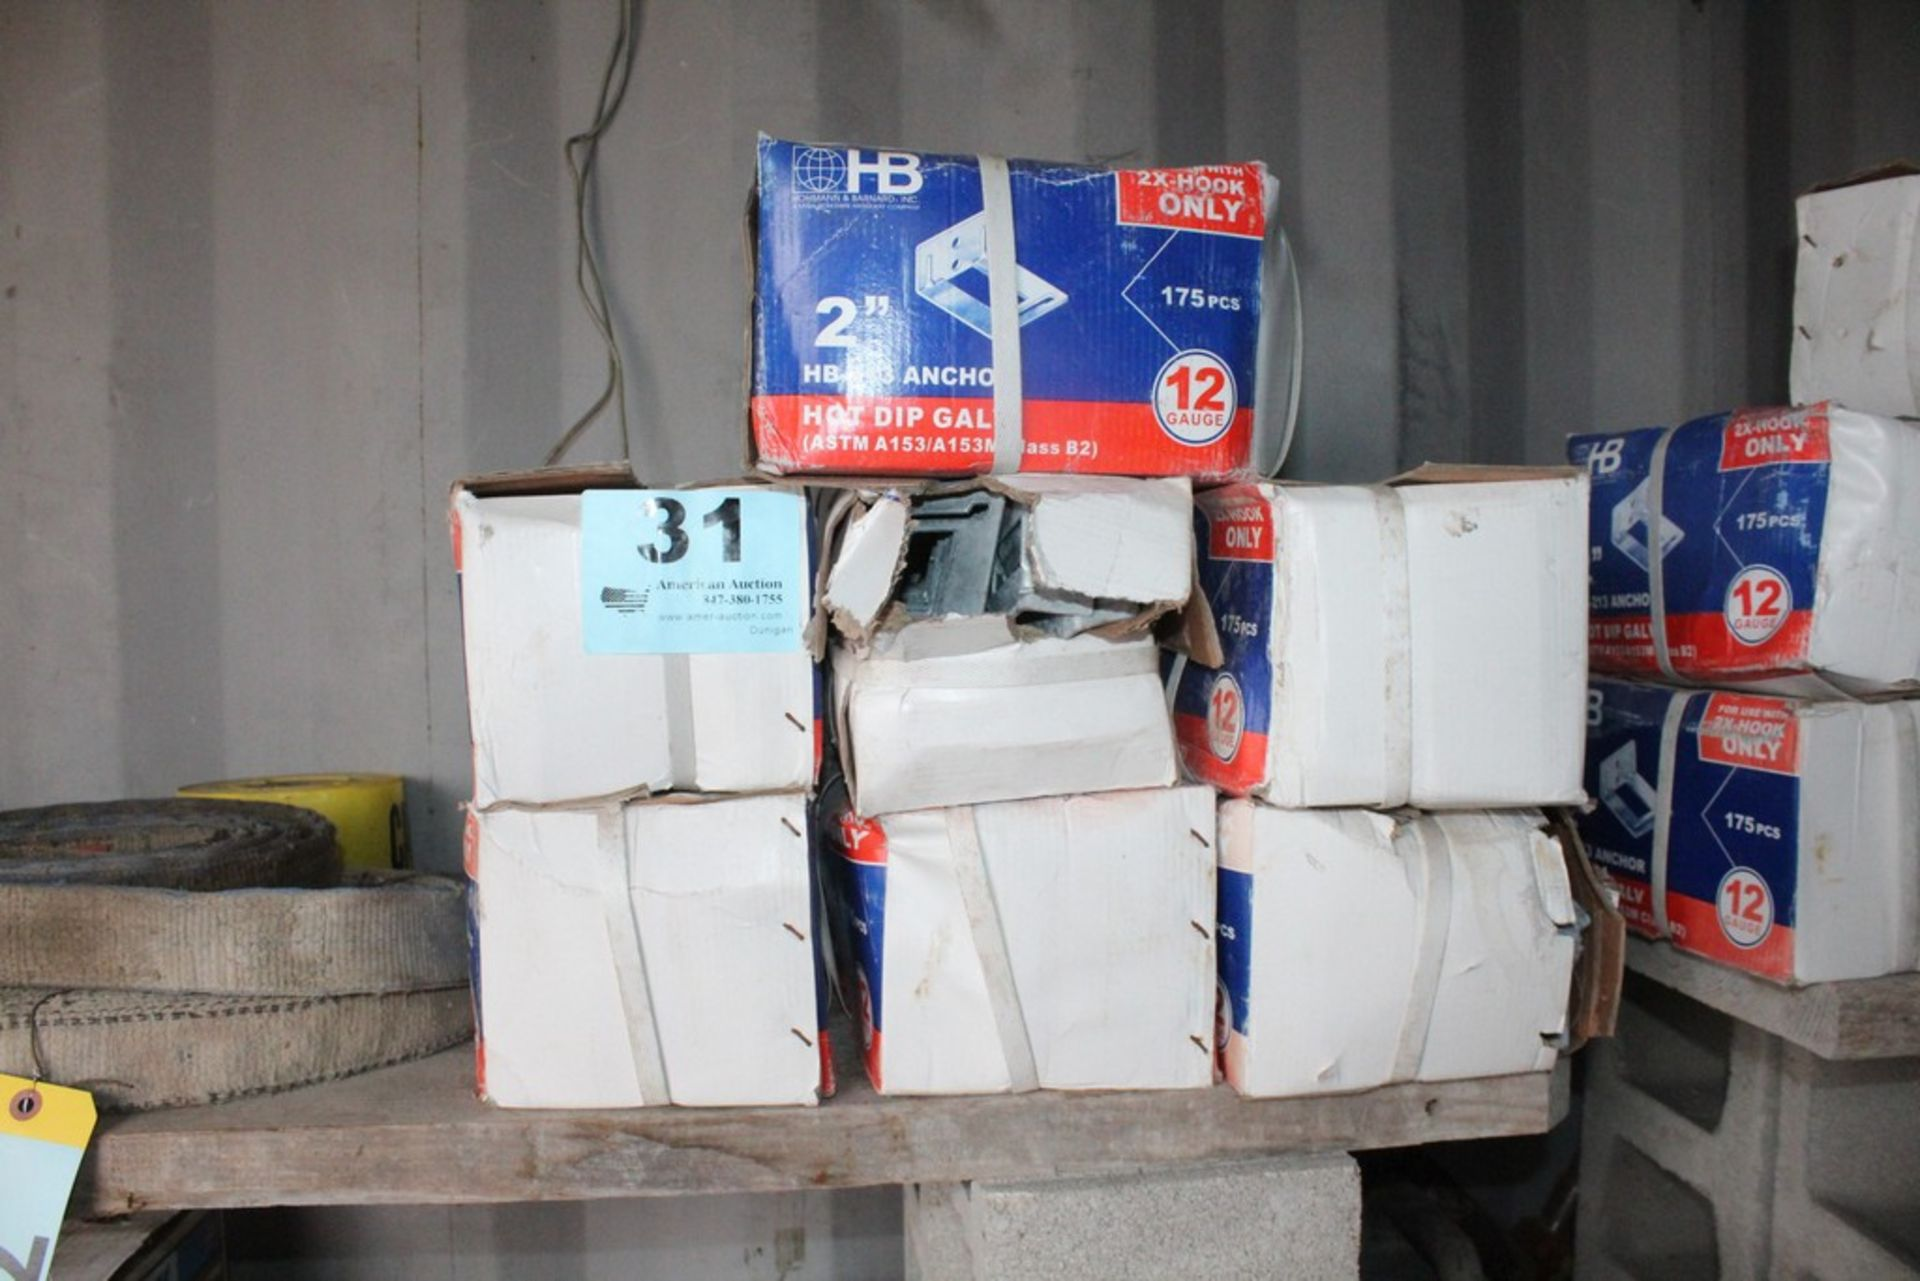 "Lot 31 - (7) BOXES OF HOHMANN & BARNARD HB 213 2"" ADJUSTABLE VENEER ANCHORS 175 PER BOX"